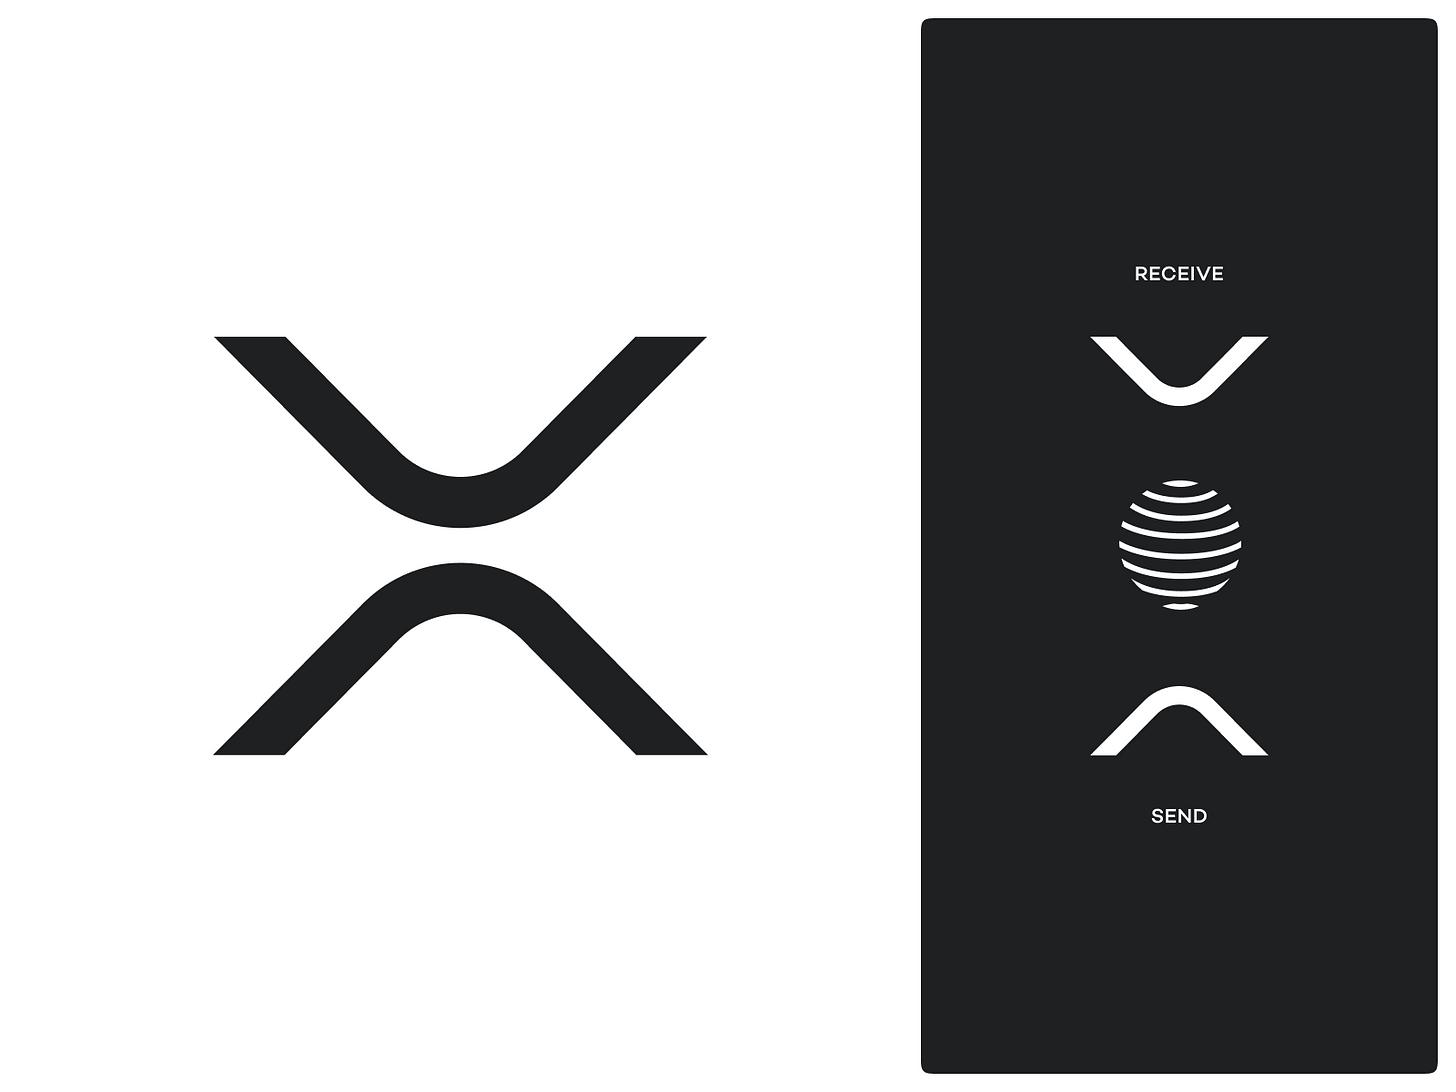 XRP Symbol xrp ripple bitcoin crypto identity branding logo icon